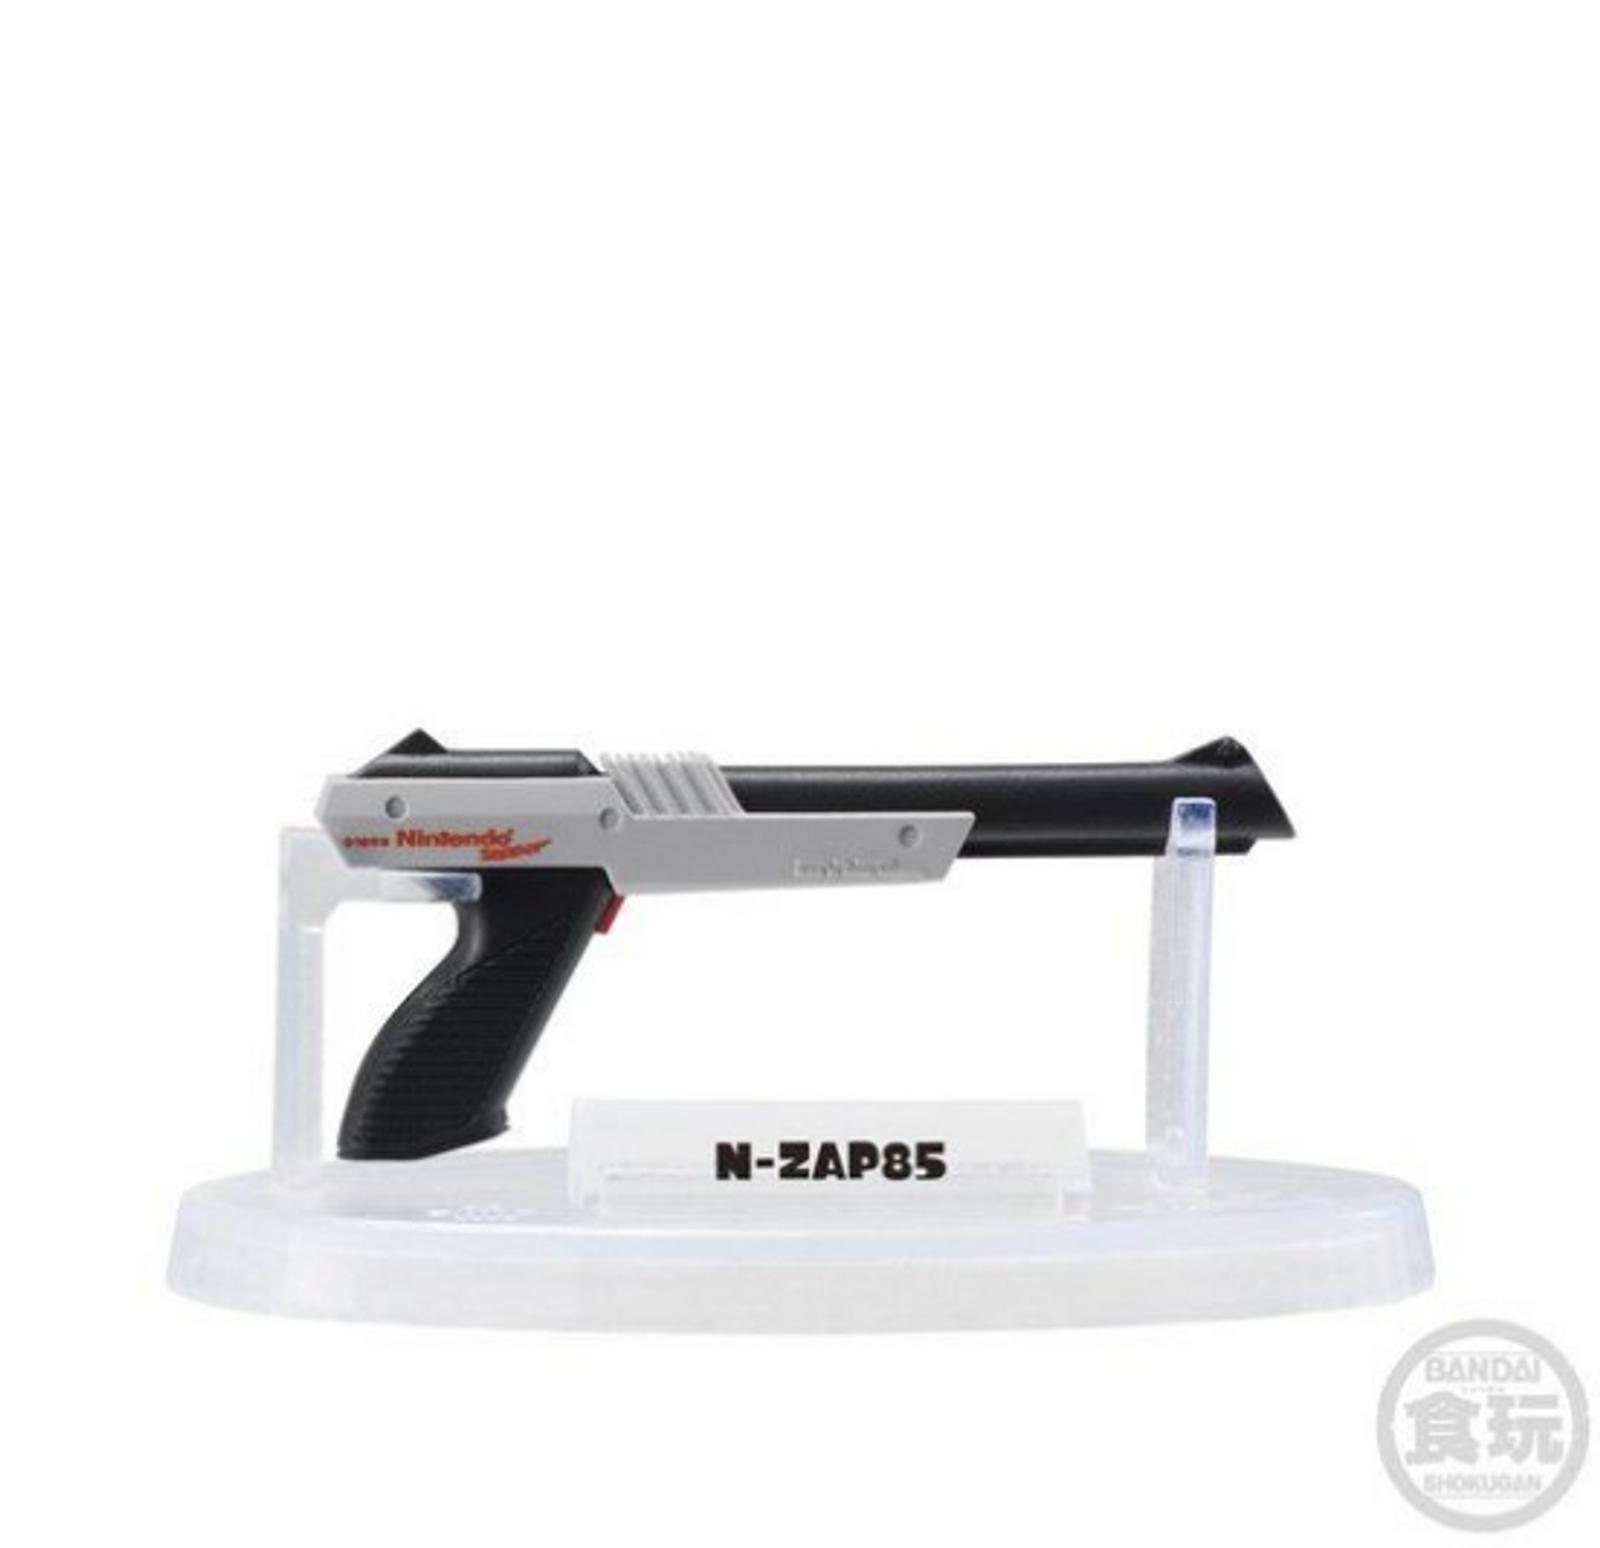 Splatoon 2 N-ZAP '85 Weapon Figure Collection JAPAN Nintendo Switch